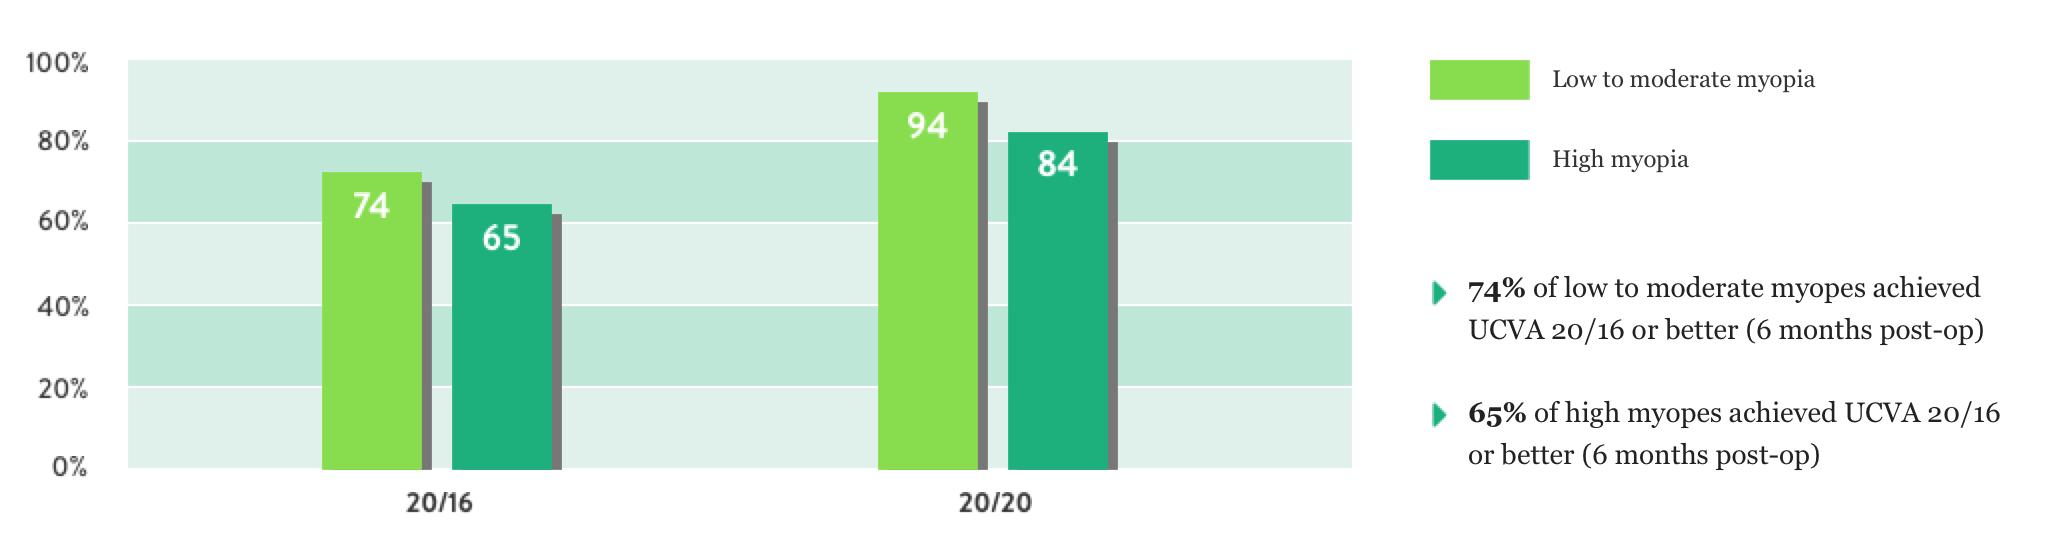 green colored bar graph